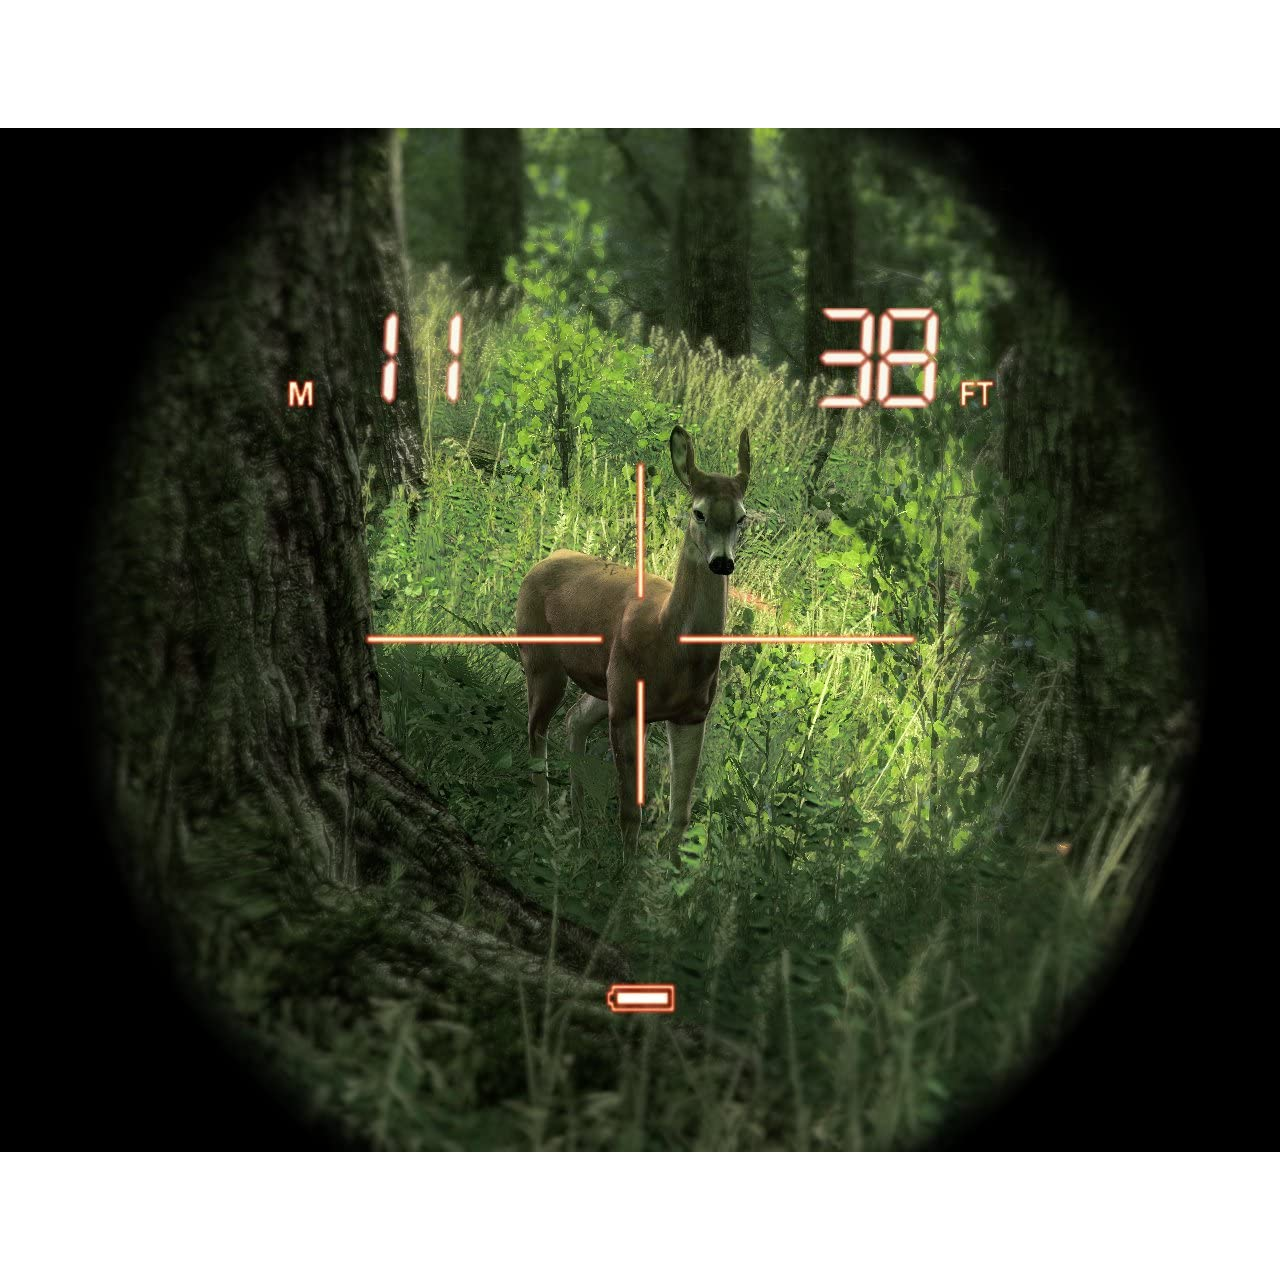 71FVVCrcMGL. AA1280  The Hunter 2012 HI2U Free Download